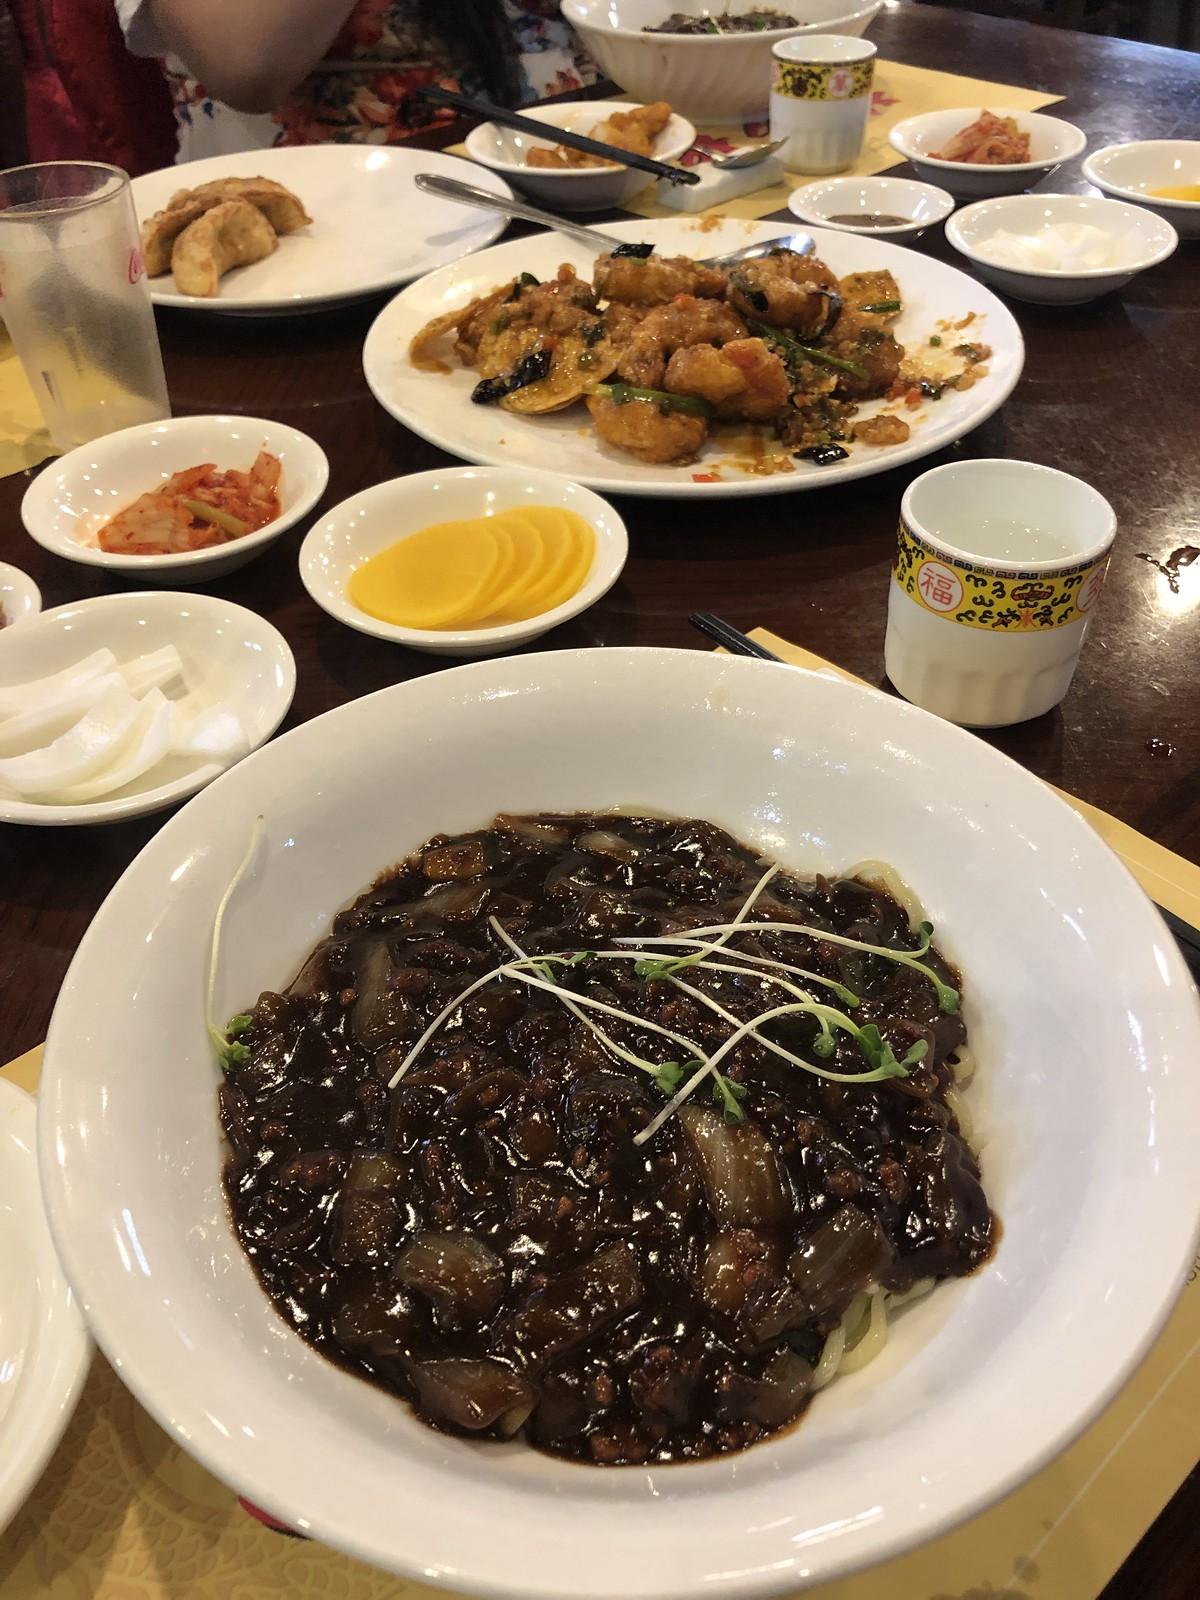 Jjajangmyeon(짜장면)   Things to eat in Korea